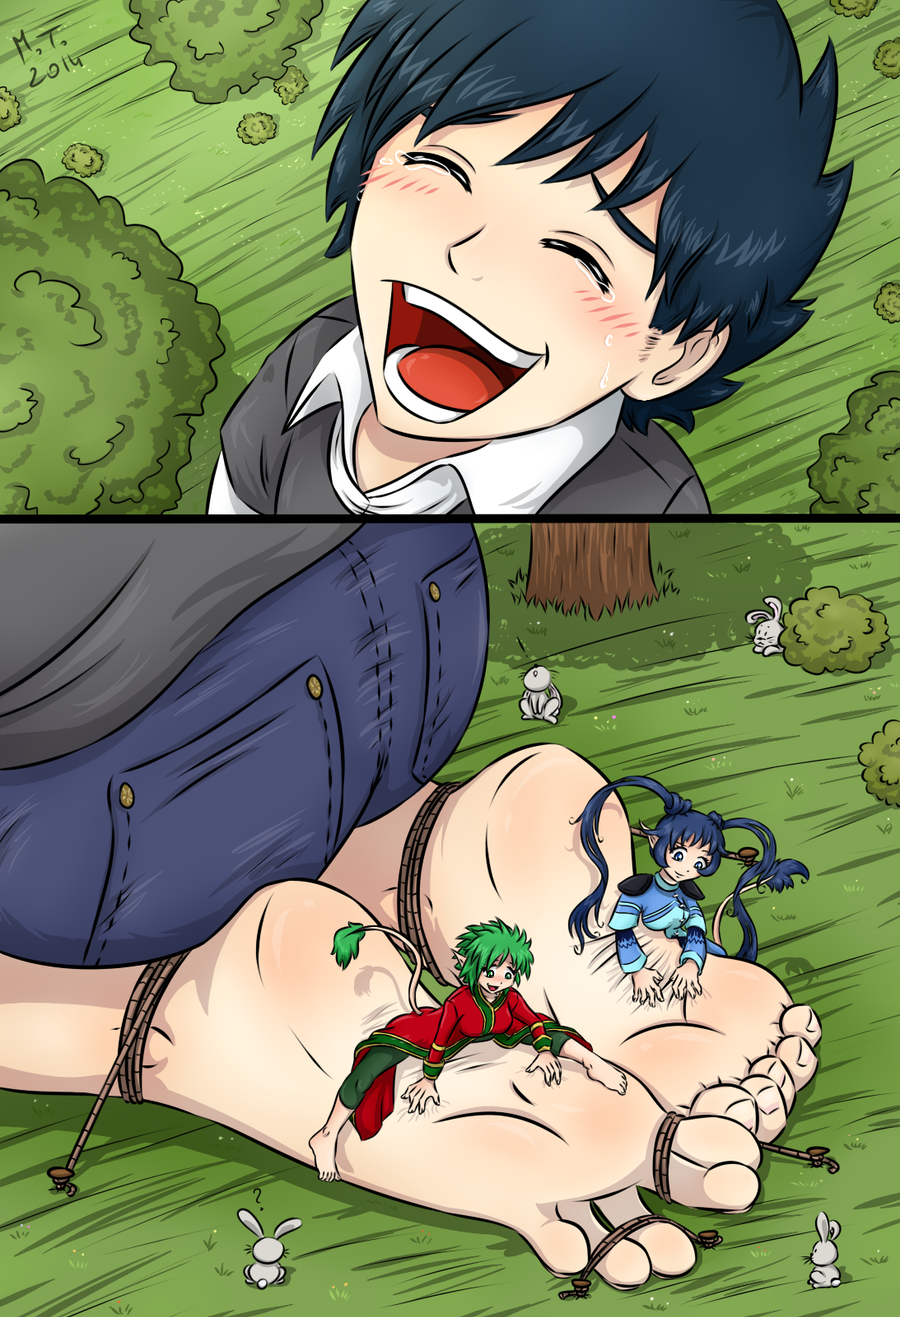 Anime ticklish dick hentay pic